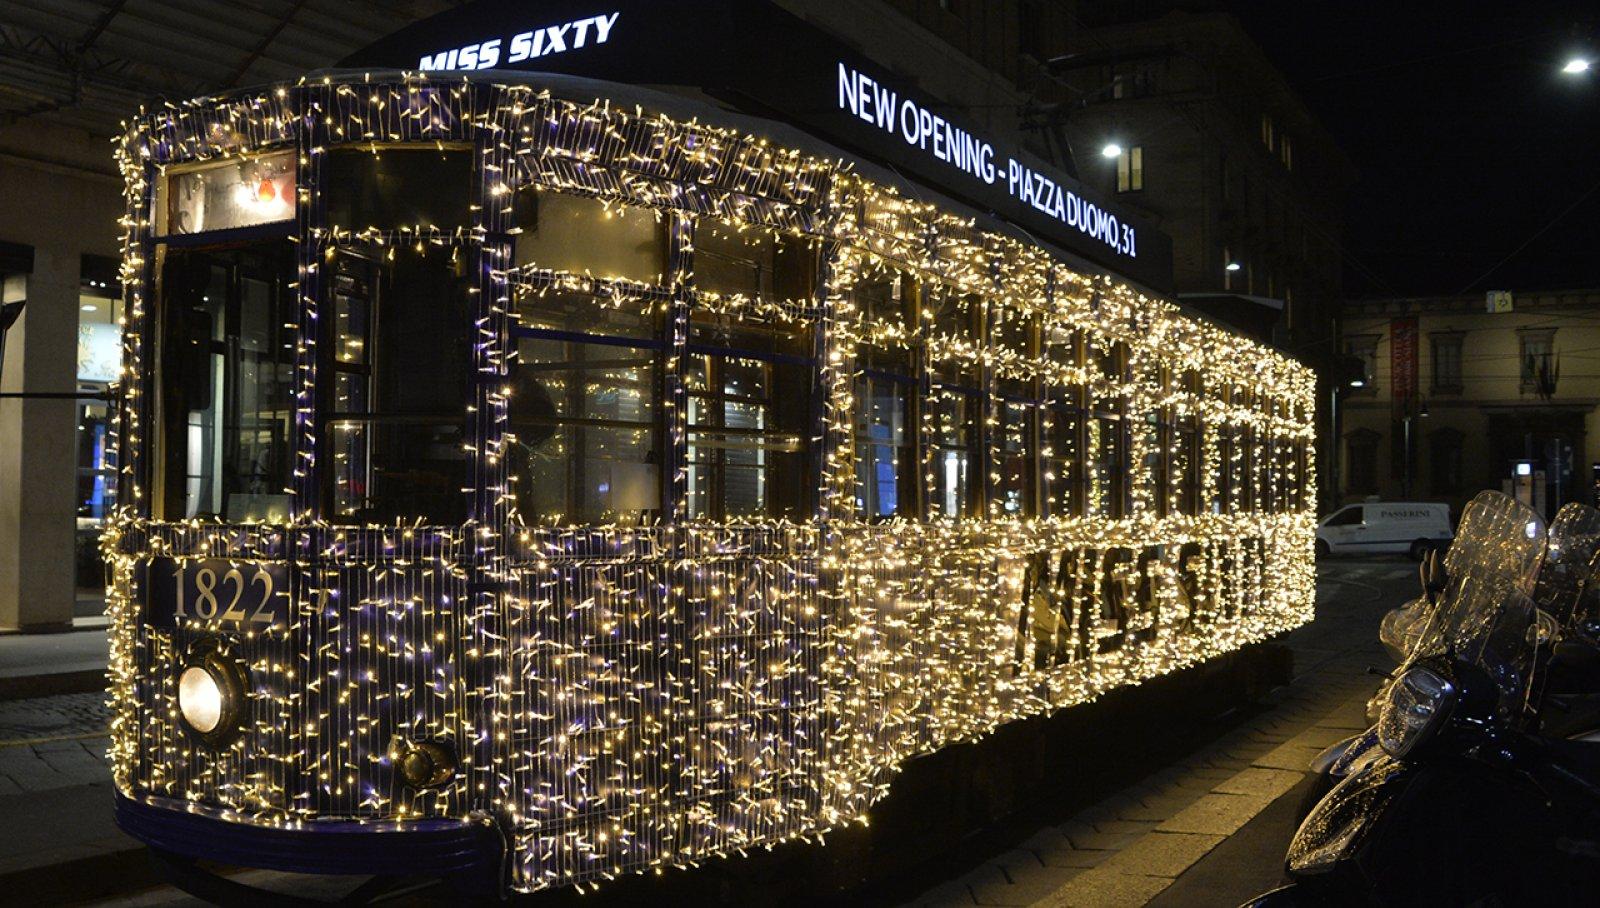 Tram Luci Darsena Miss Sixty